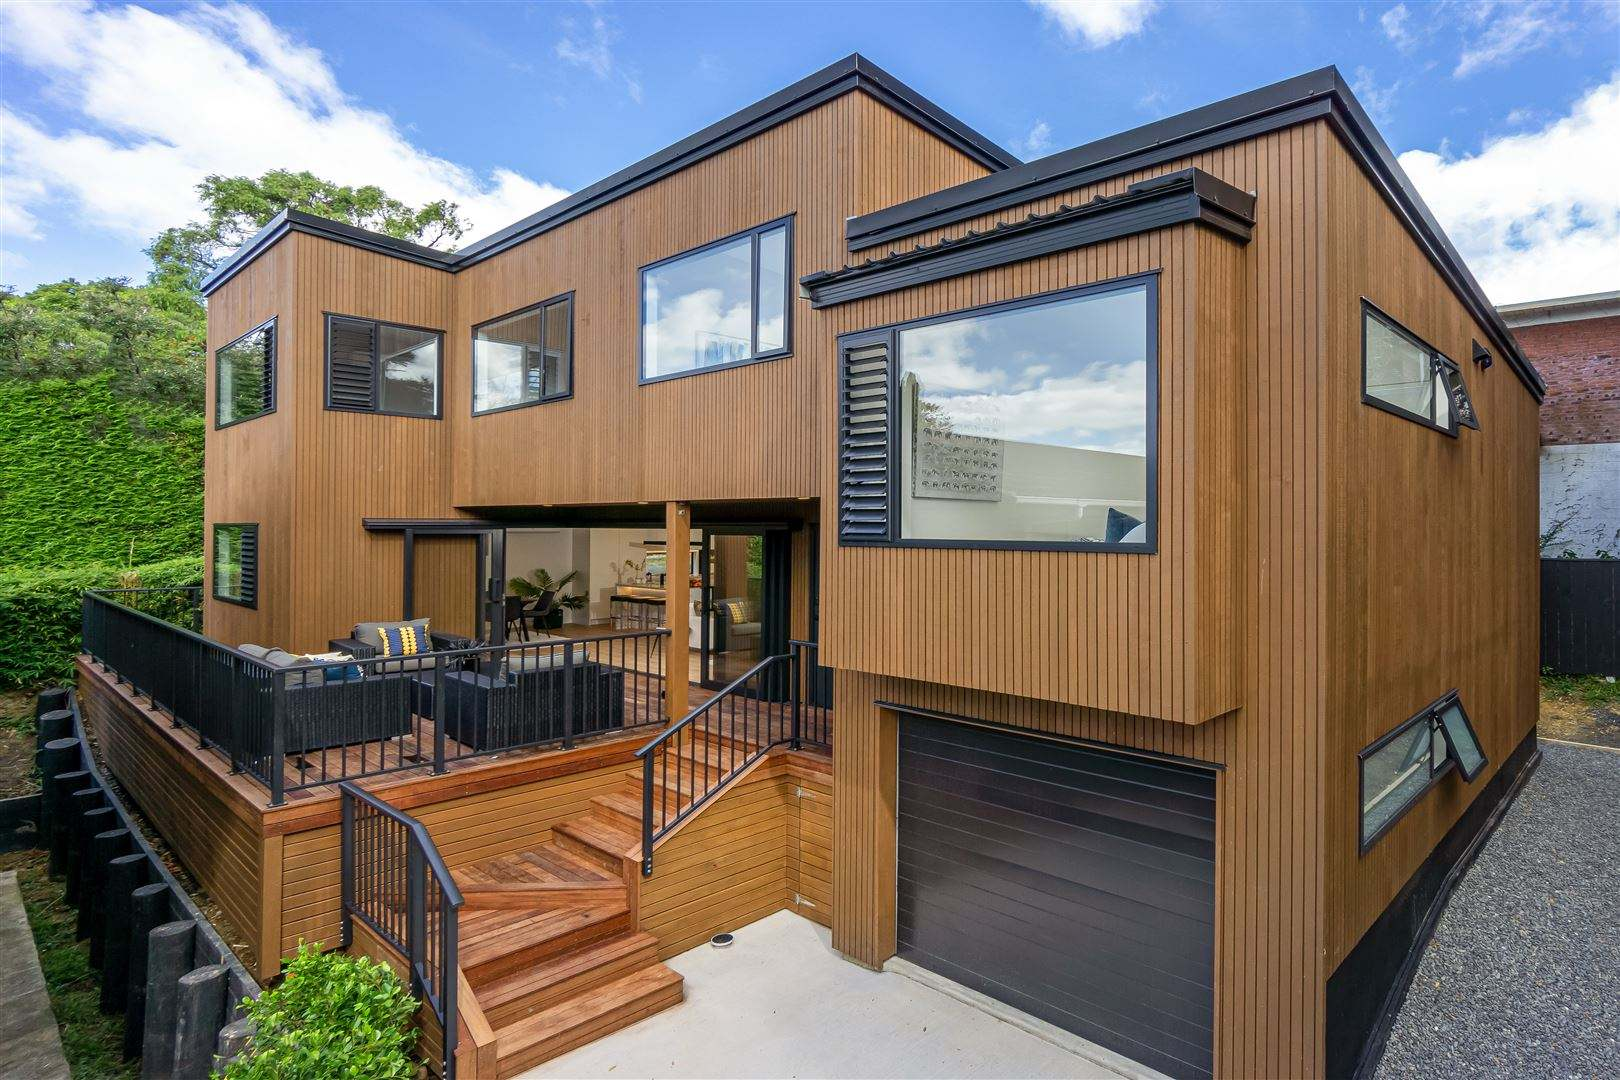 Mairangi Bay 4房 全新雪松木美居 带10年建筑质保 好校云集 步行抵达海滩 开启浪漫舒心生活! Stunning new Cedar Home - Priced. Make me an offer!